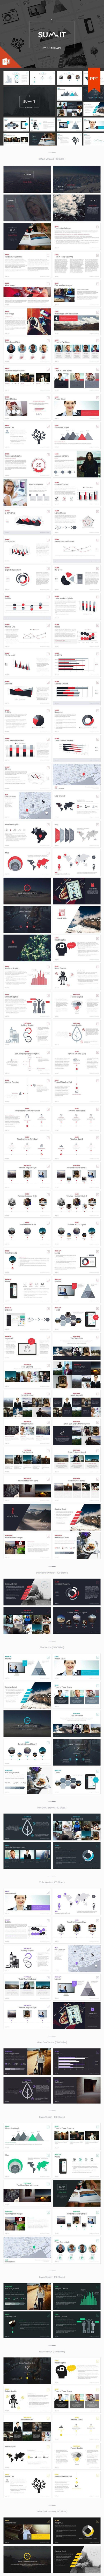 Summit PowerPoint Presentation. Google Slides Templates. $20.00